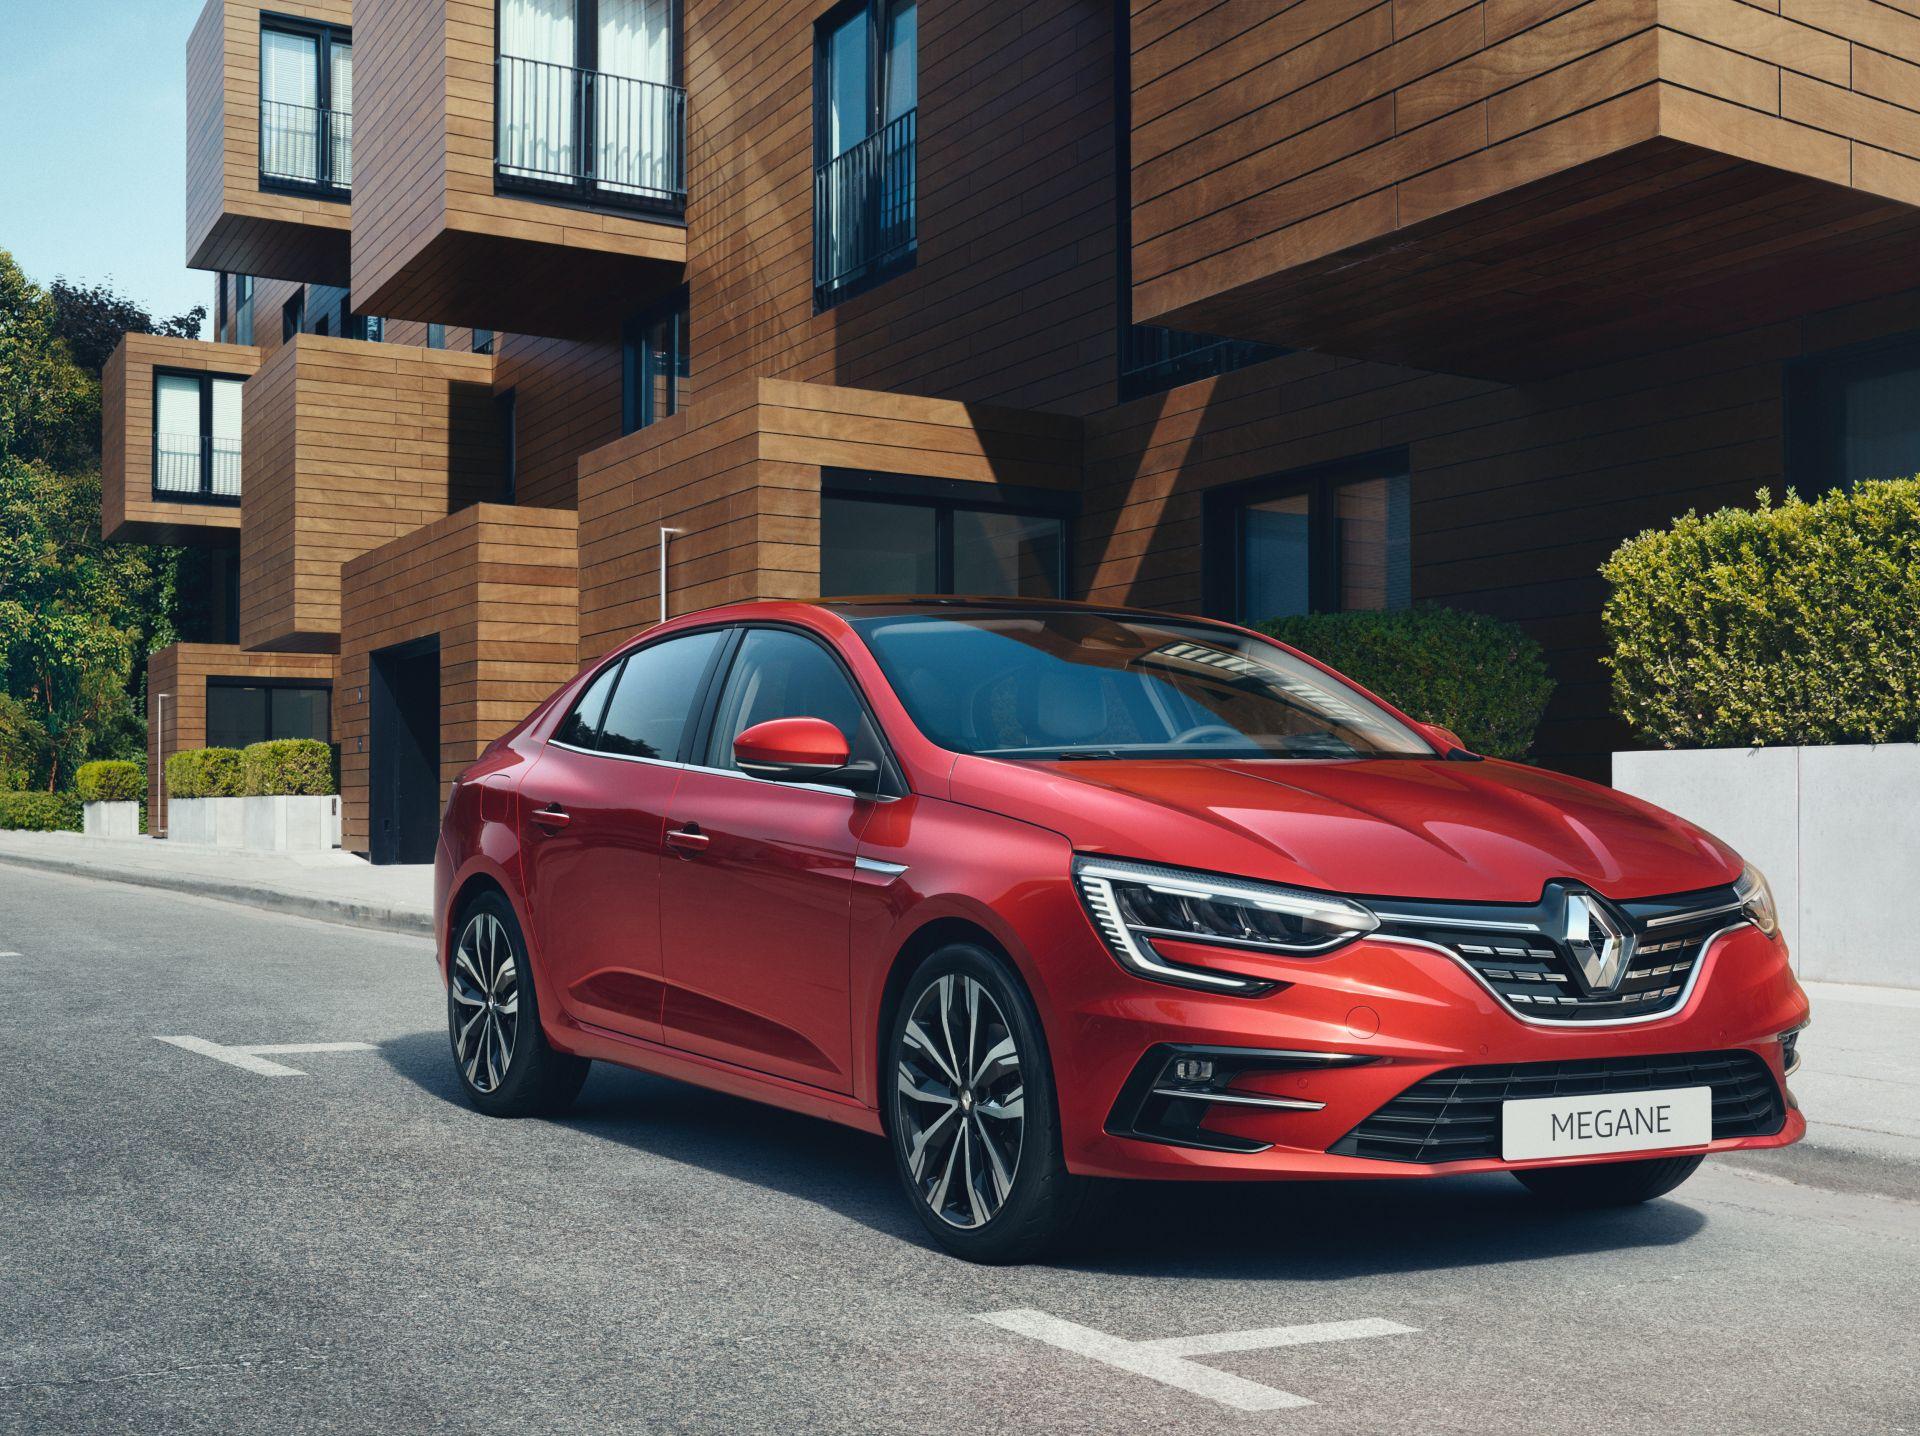 Renault-megane-grand-coupe-sedan-facelift-2021-1